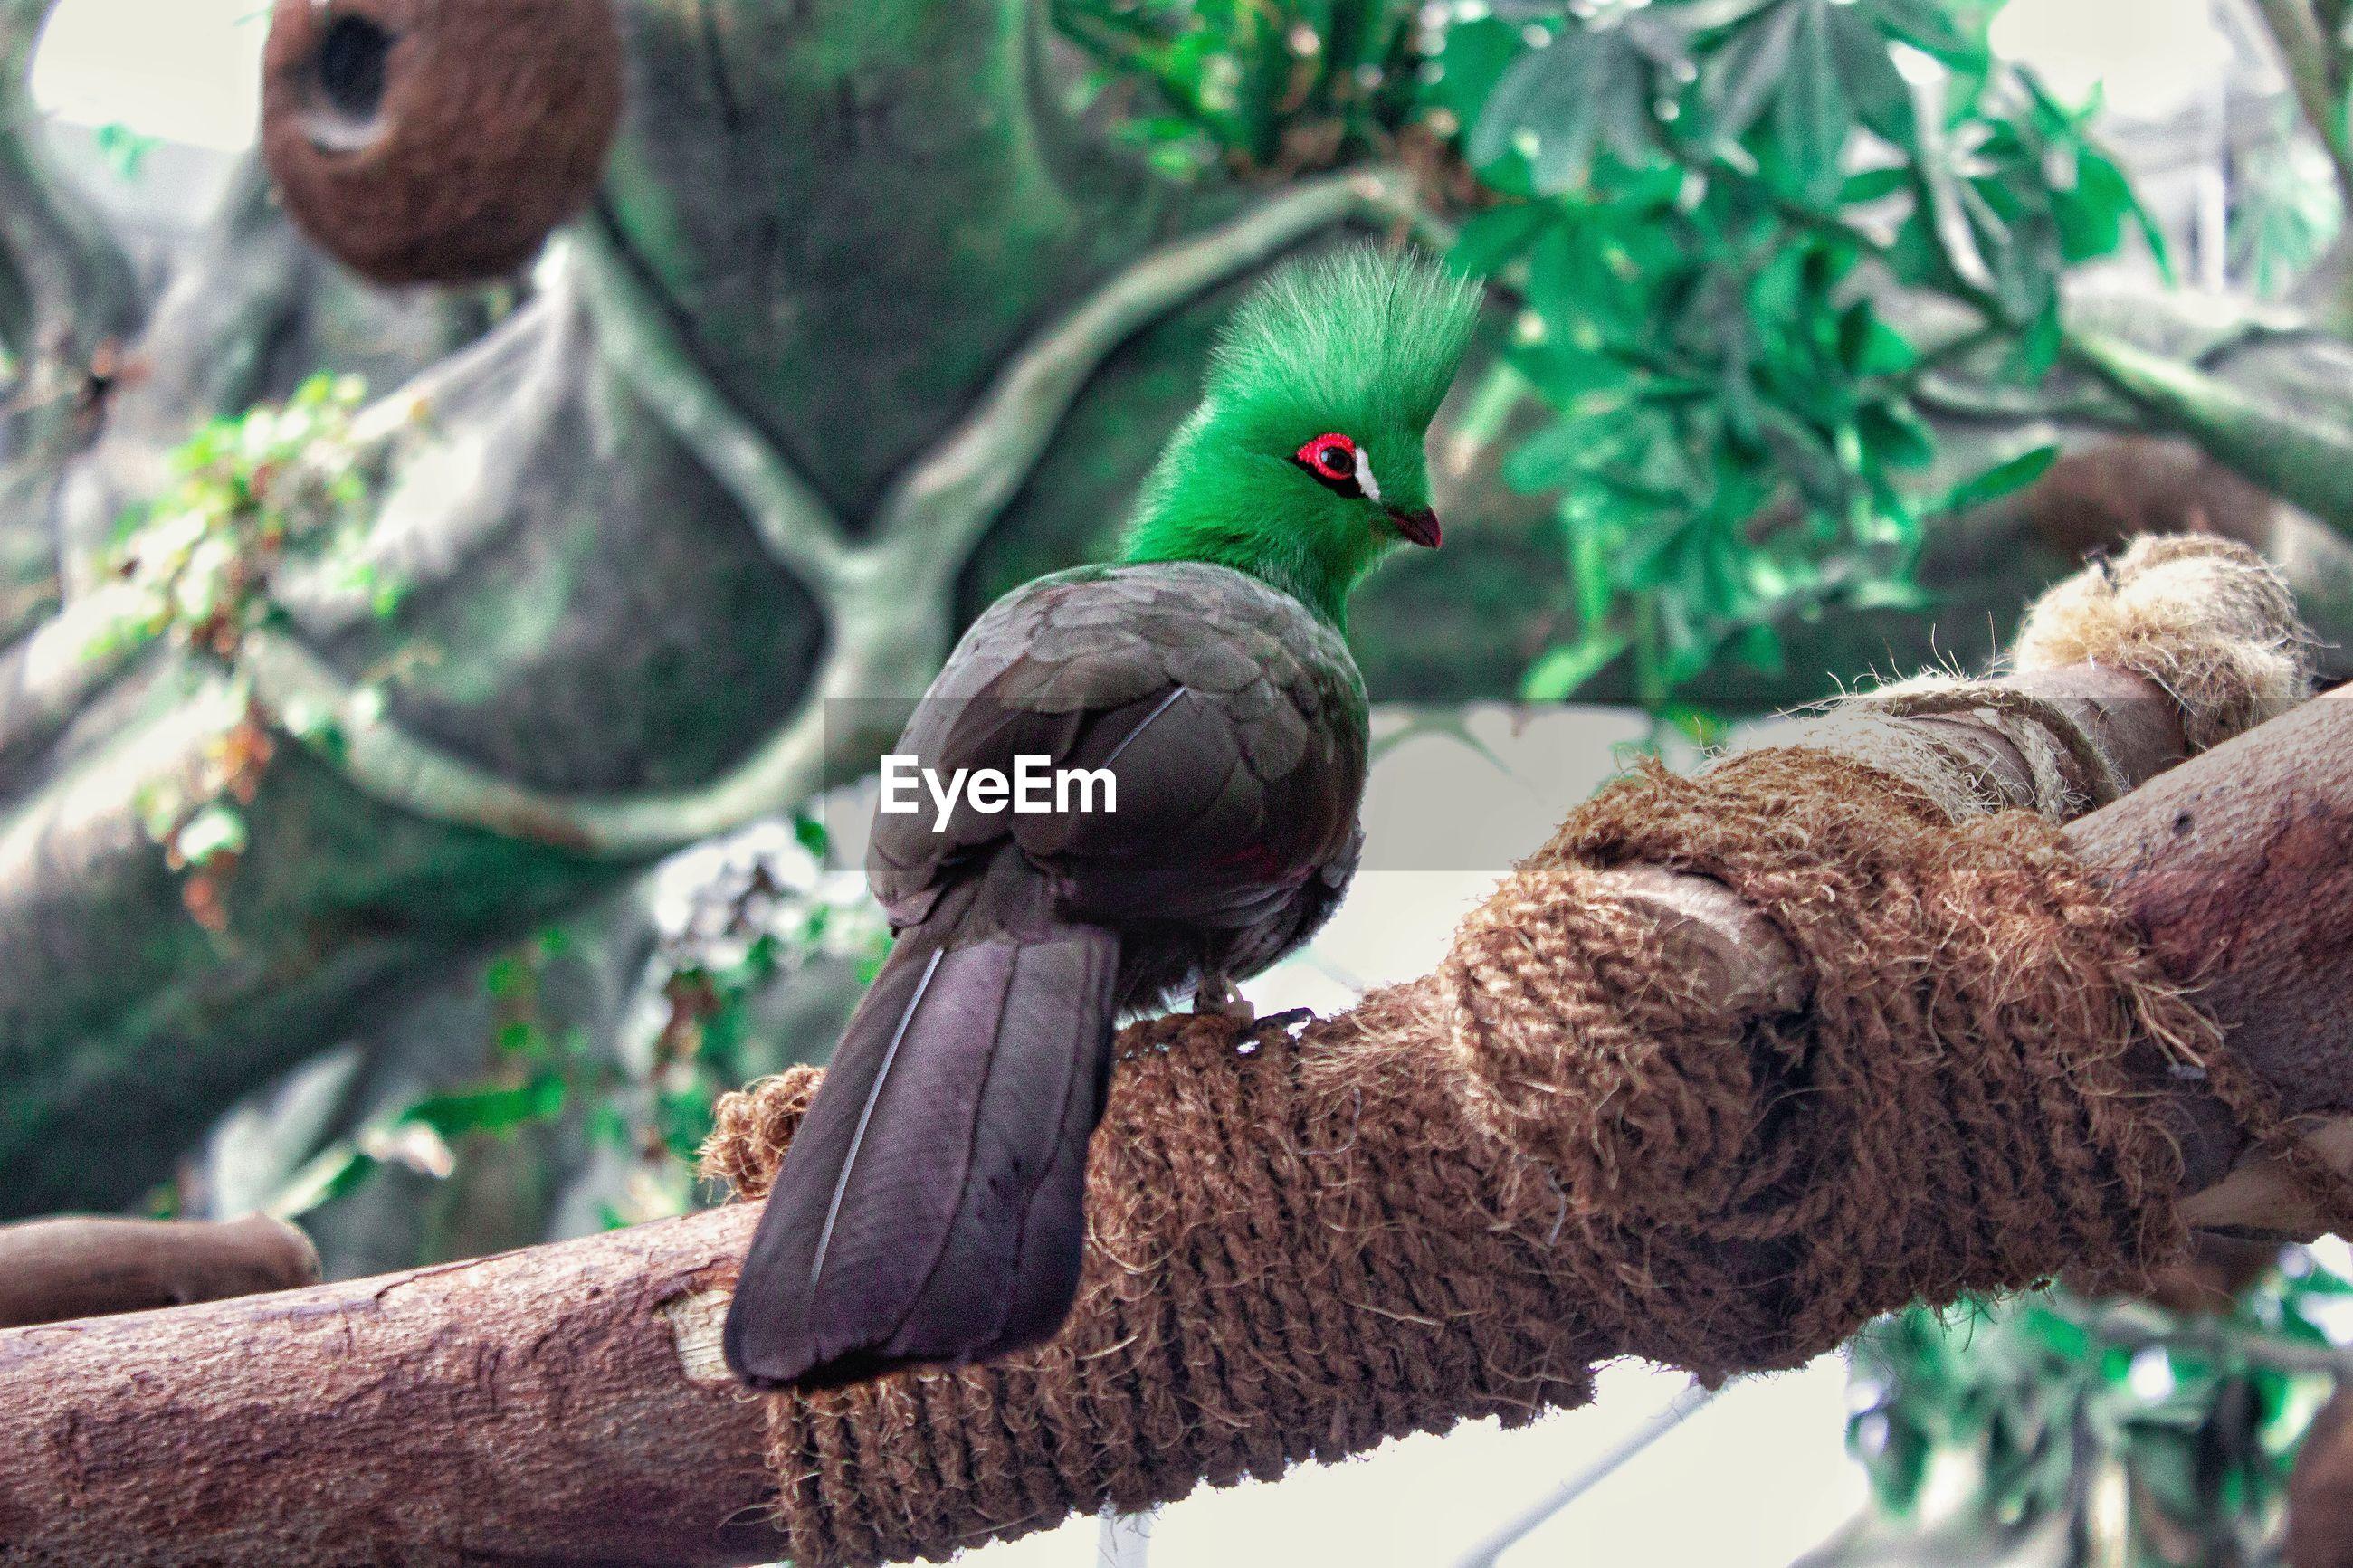 Shy green bird